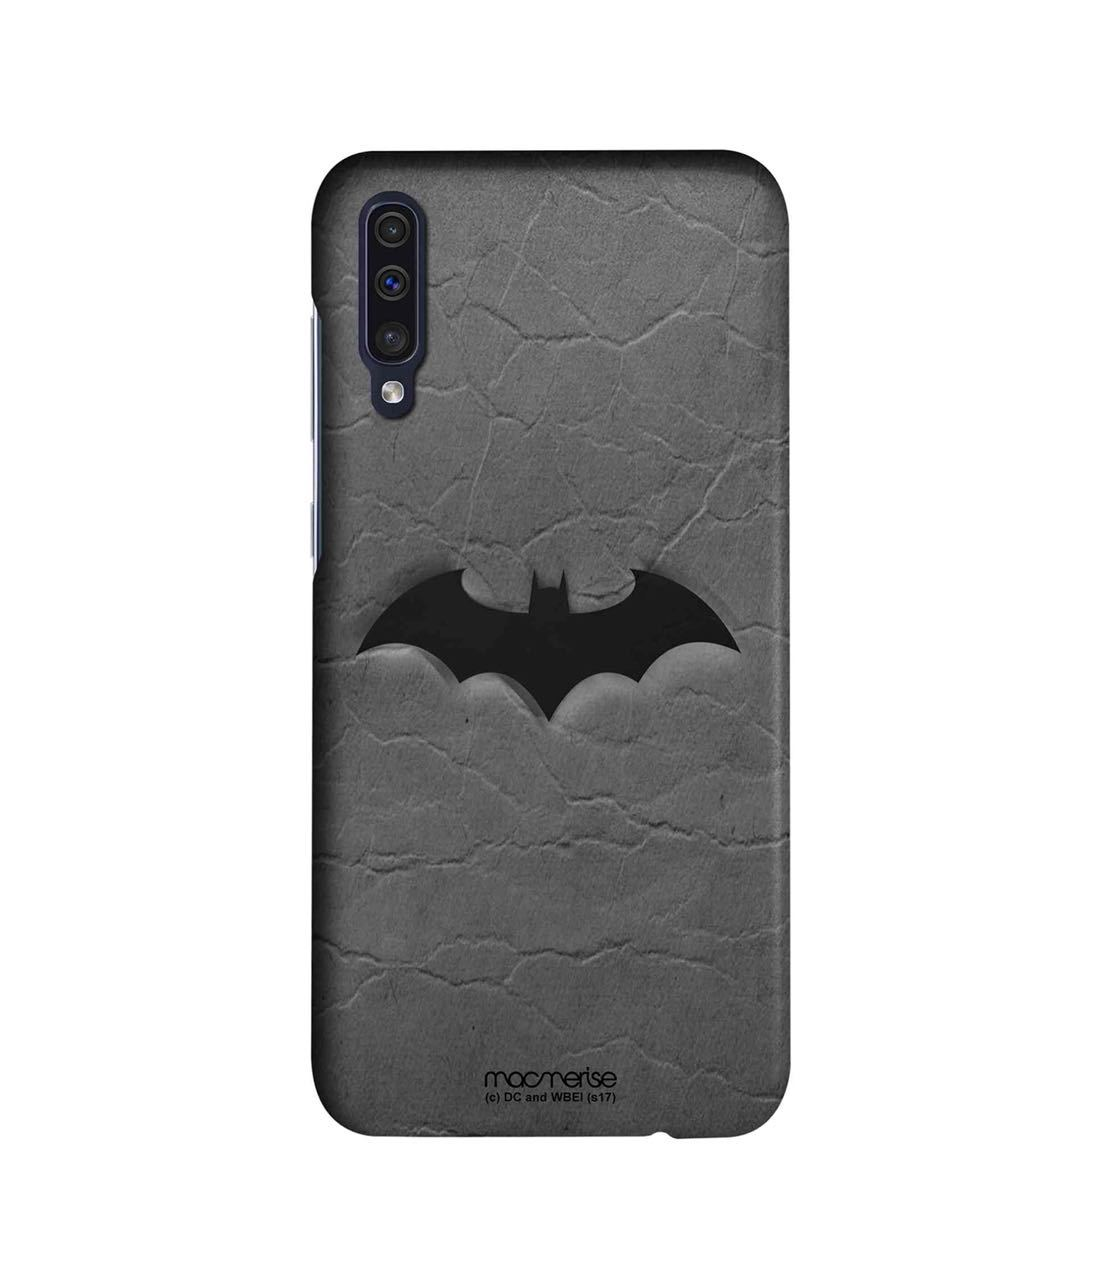 Fade Out Batman - Sleek Phone Case for Samsung A50s